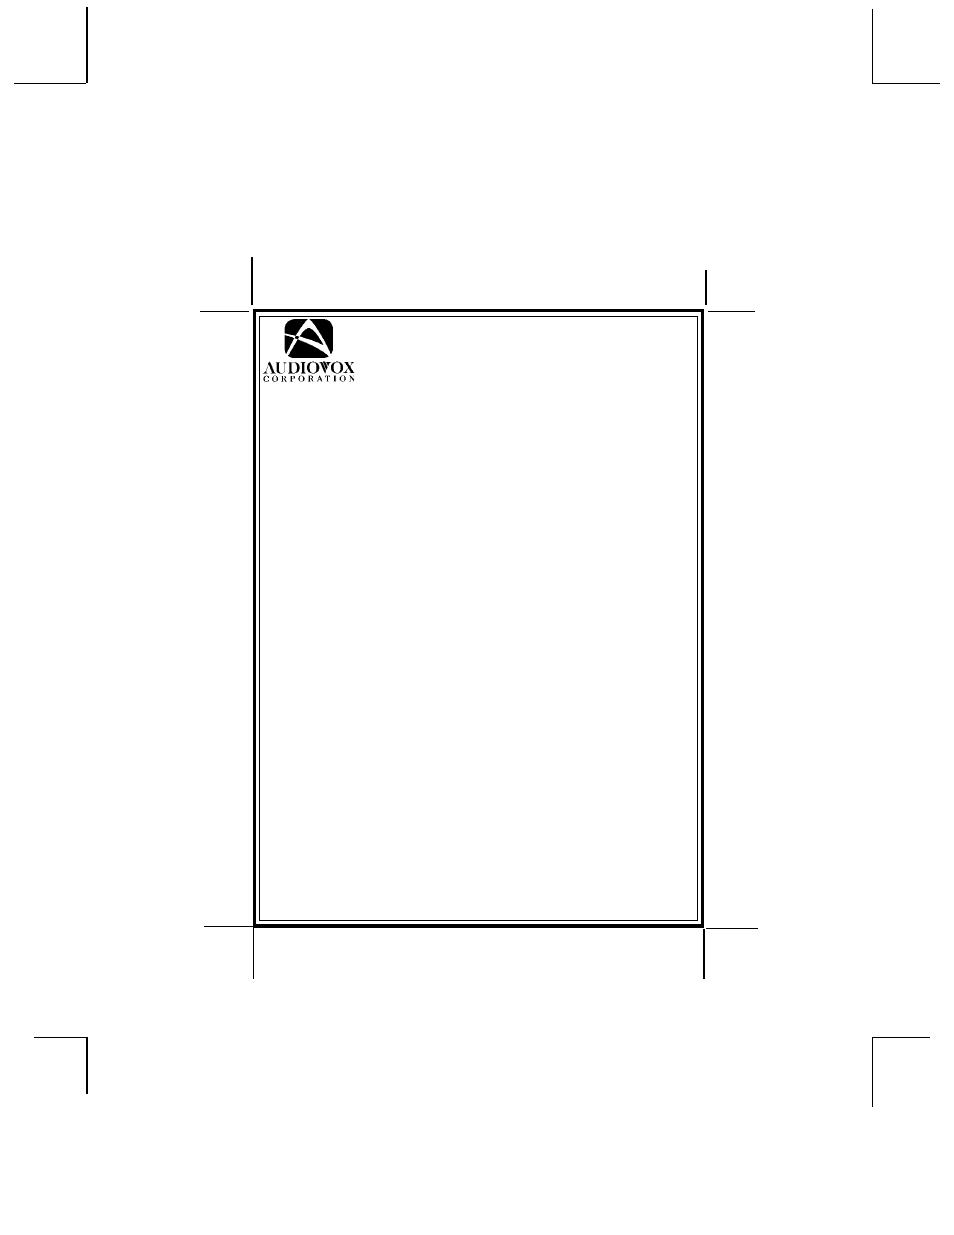 Audiovox Car Alarm Prestige 230i Wiring Diagramcar Remote Start 5bcr03 Page1 Diagram For Model Ax900 Diagrams At